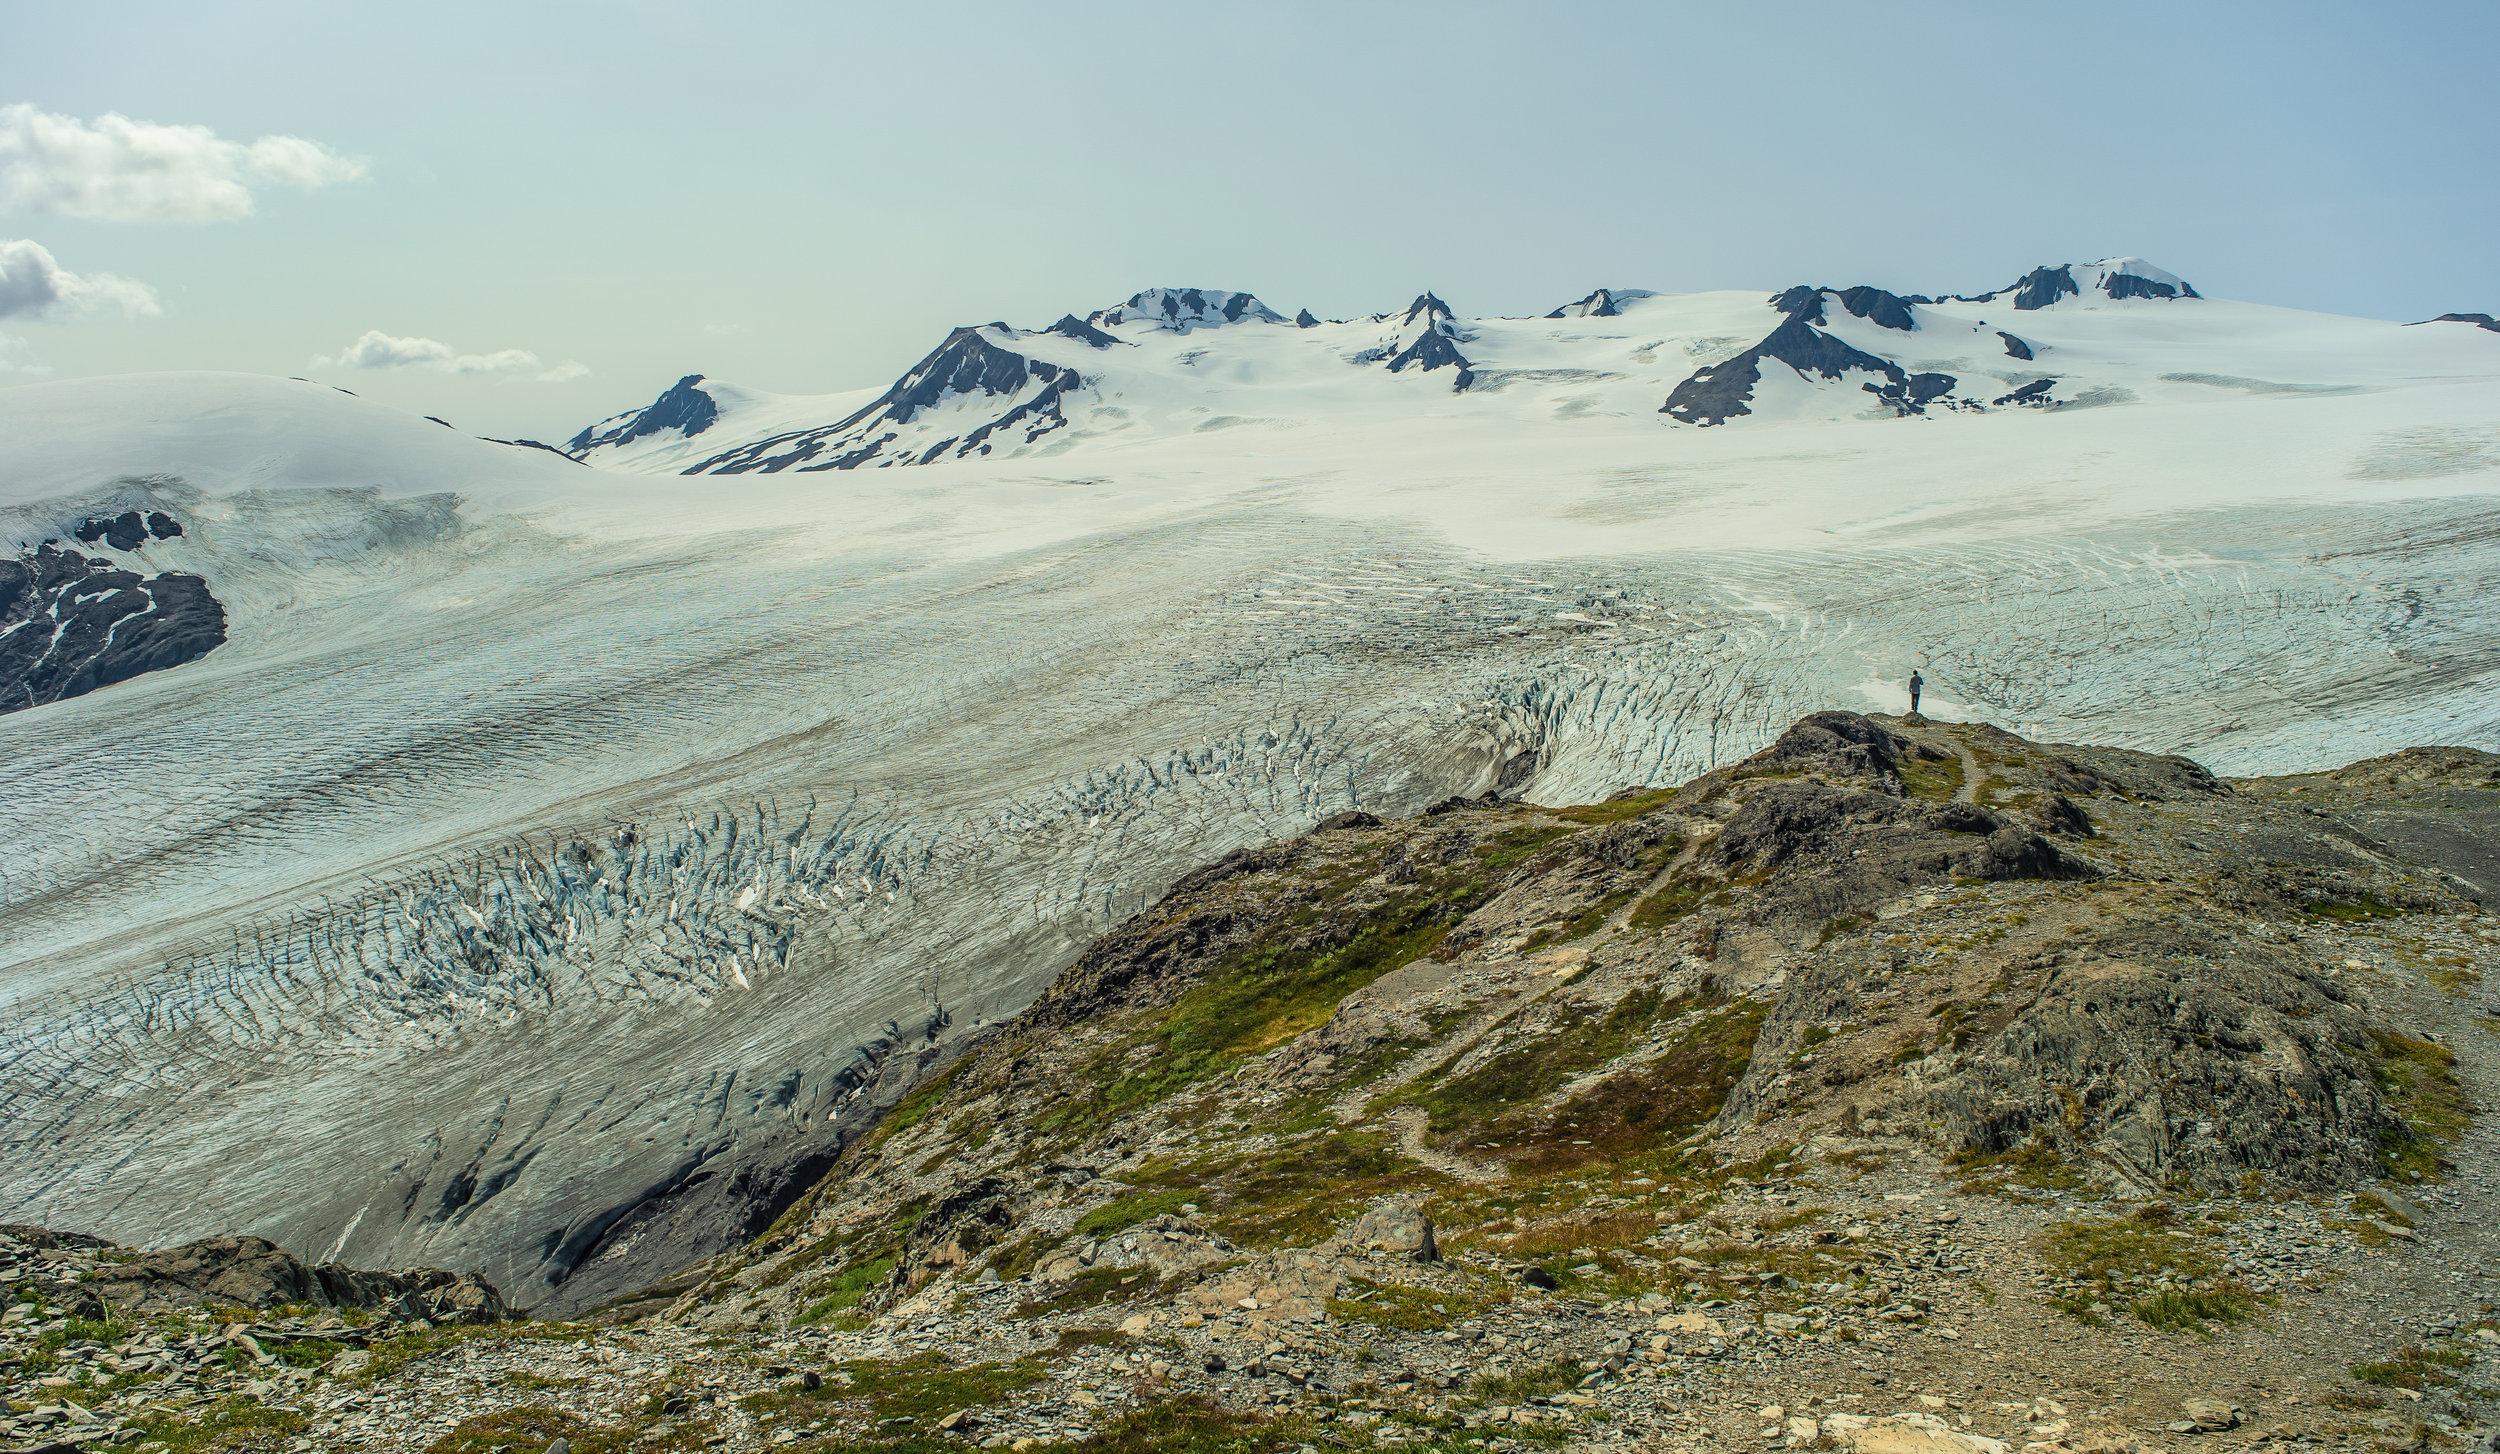 Harding Icefield, Kenai Fjords National Park, Alaska, August 2019